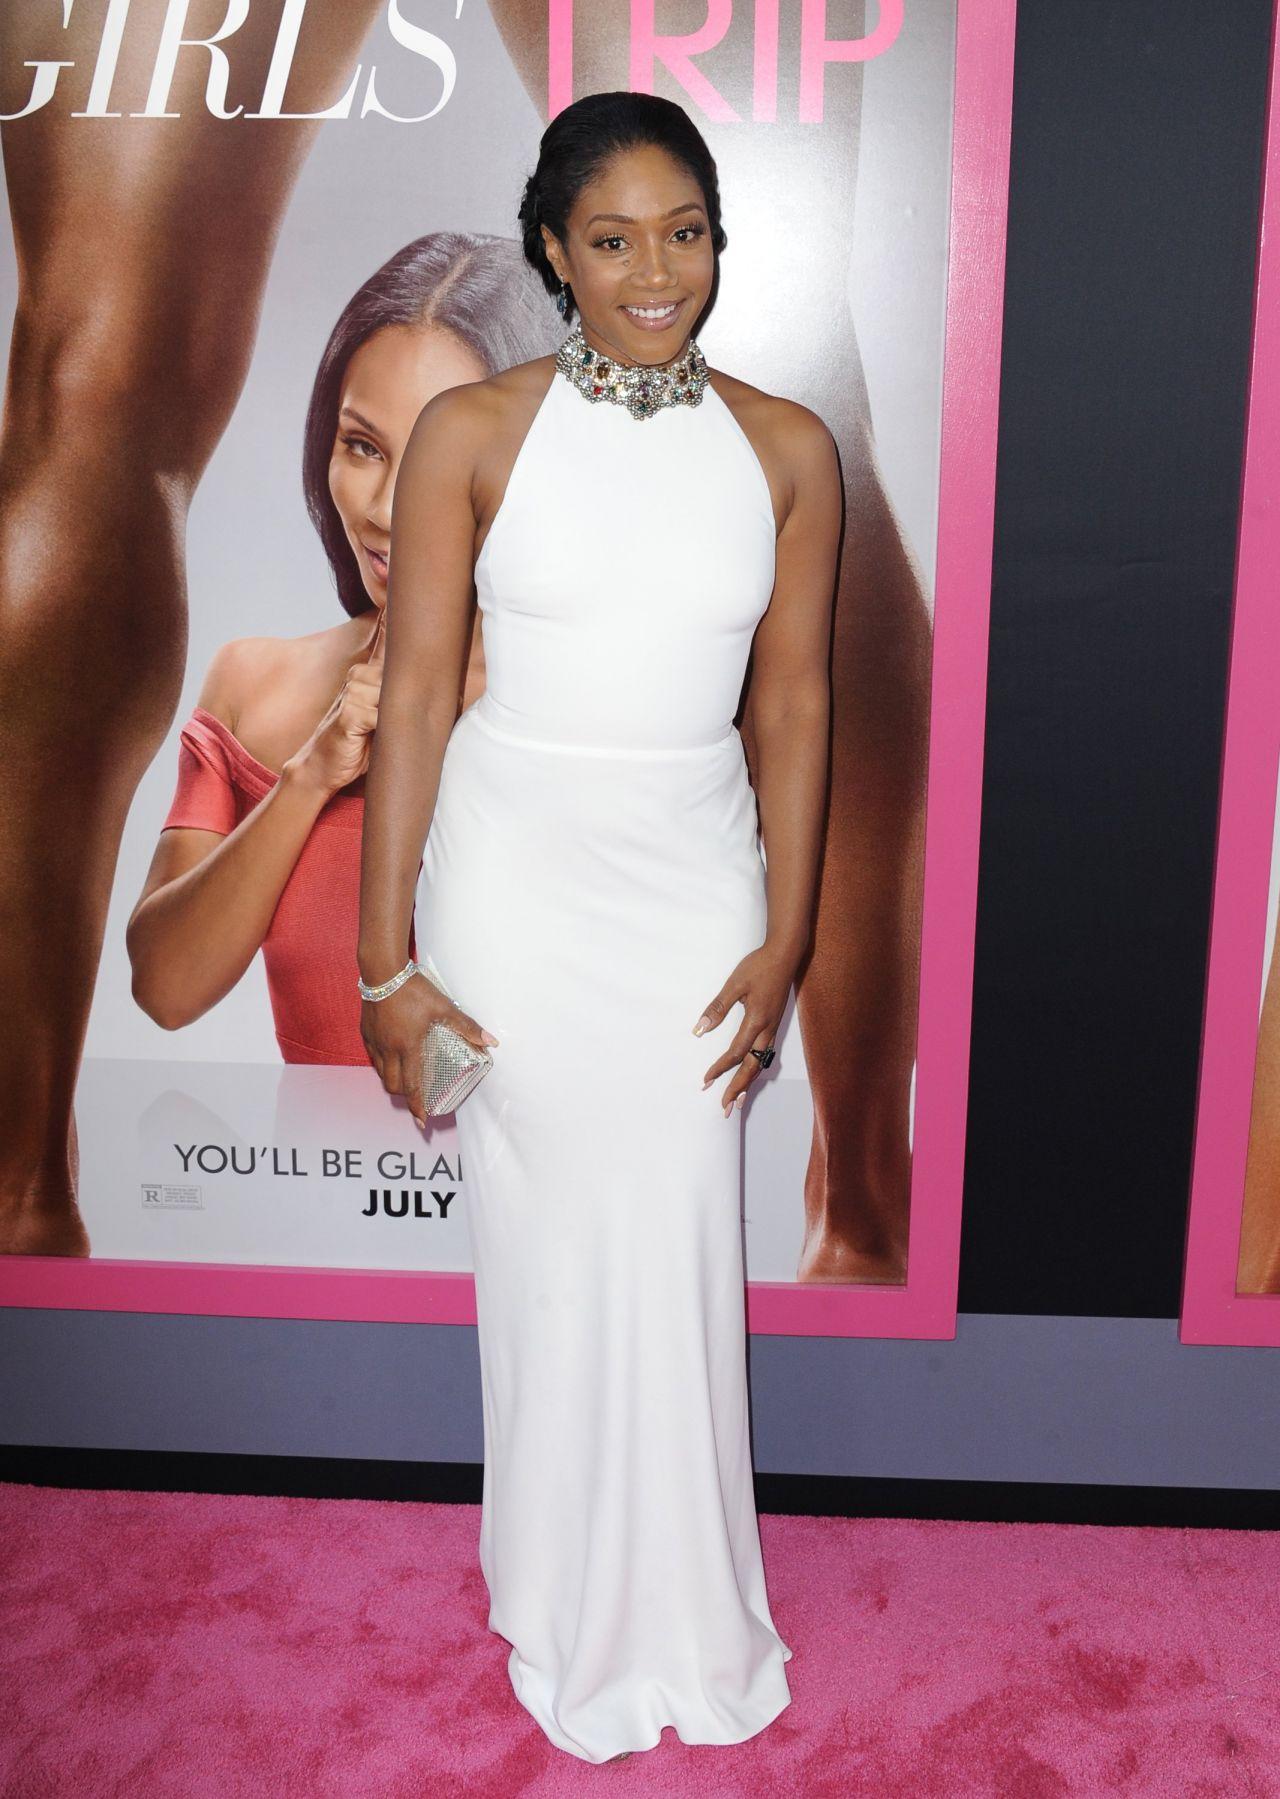 3 Times Tiffany Hadish Re-wear Her White Alexandra McQueen Dress